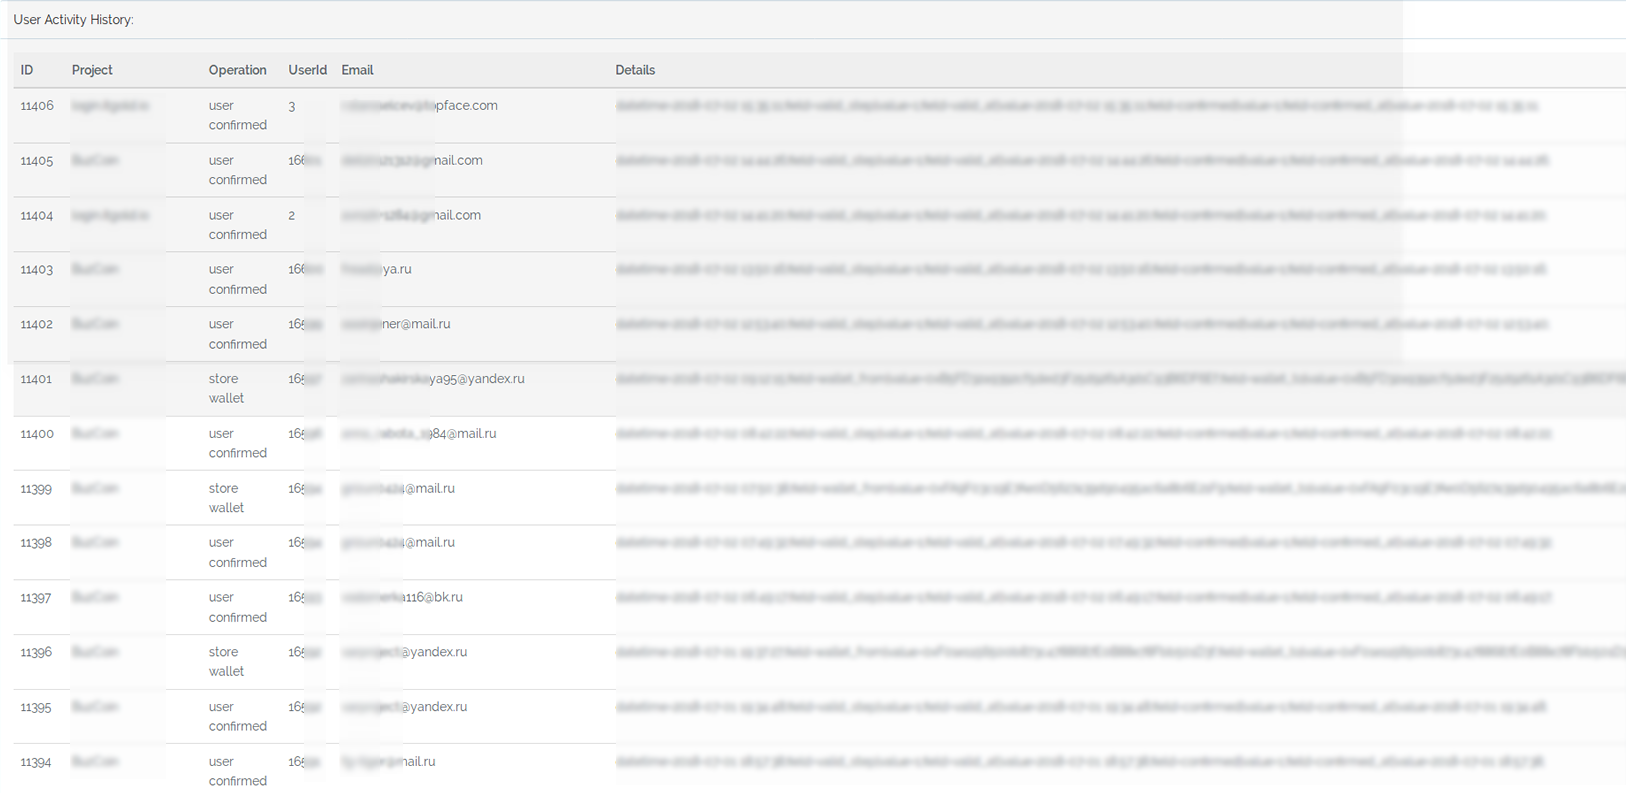 img 5b3f8804a3d63 - Скриншоты админки